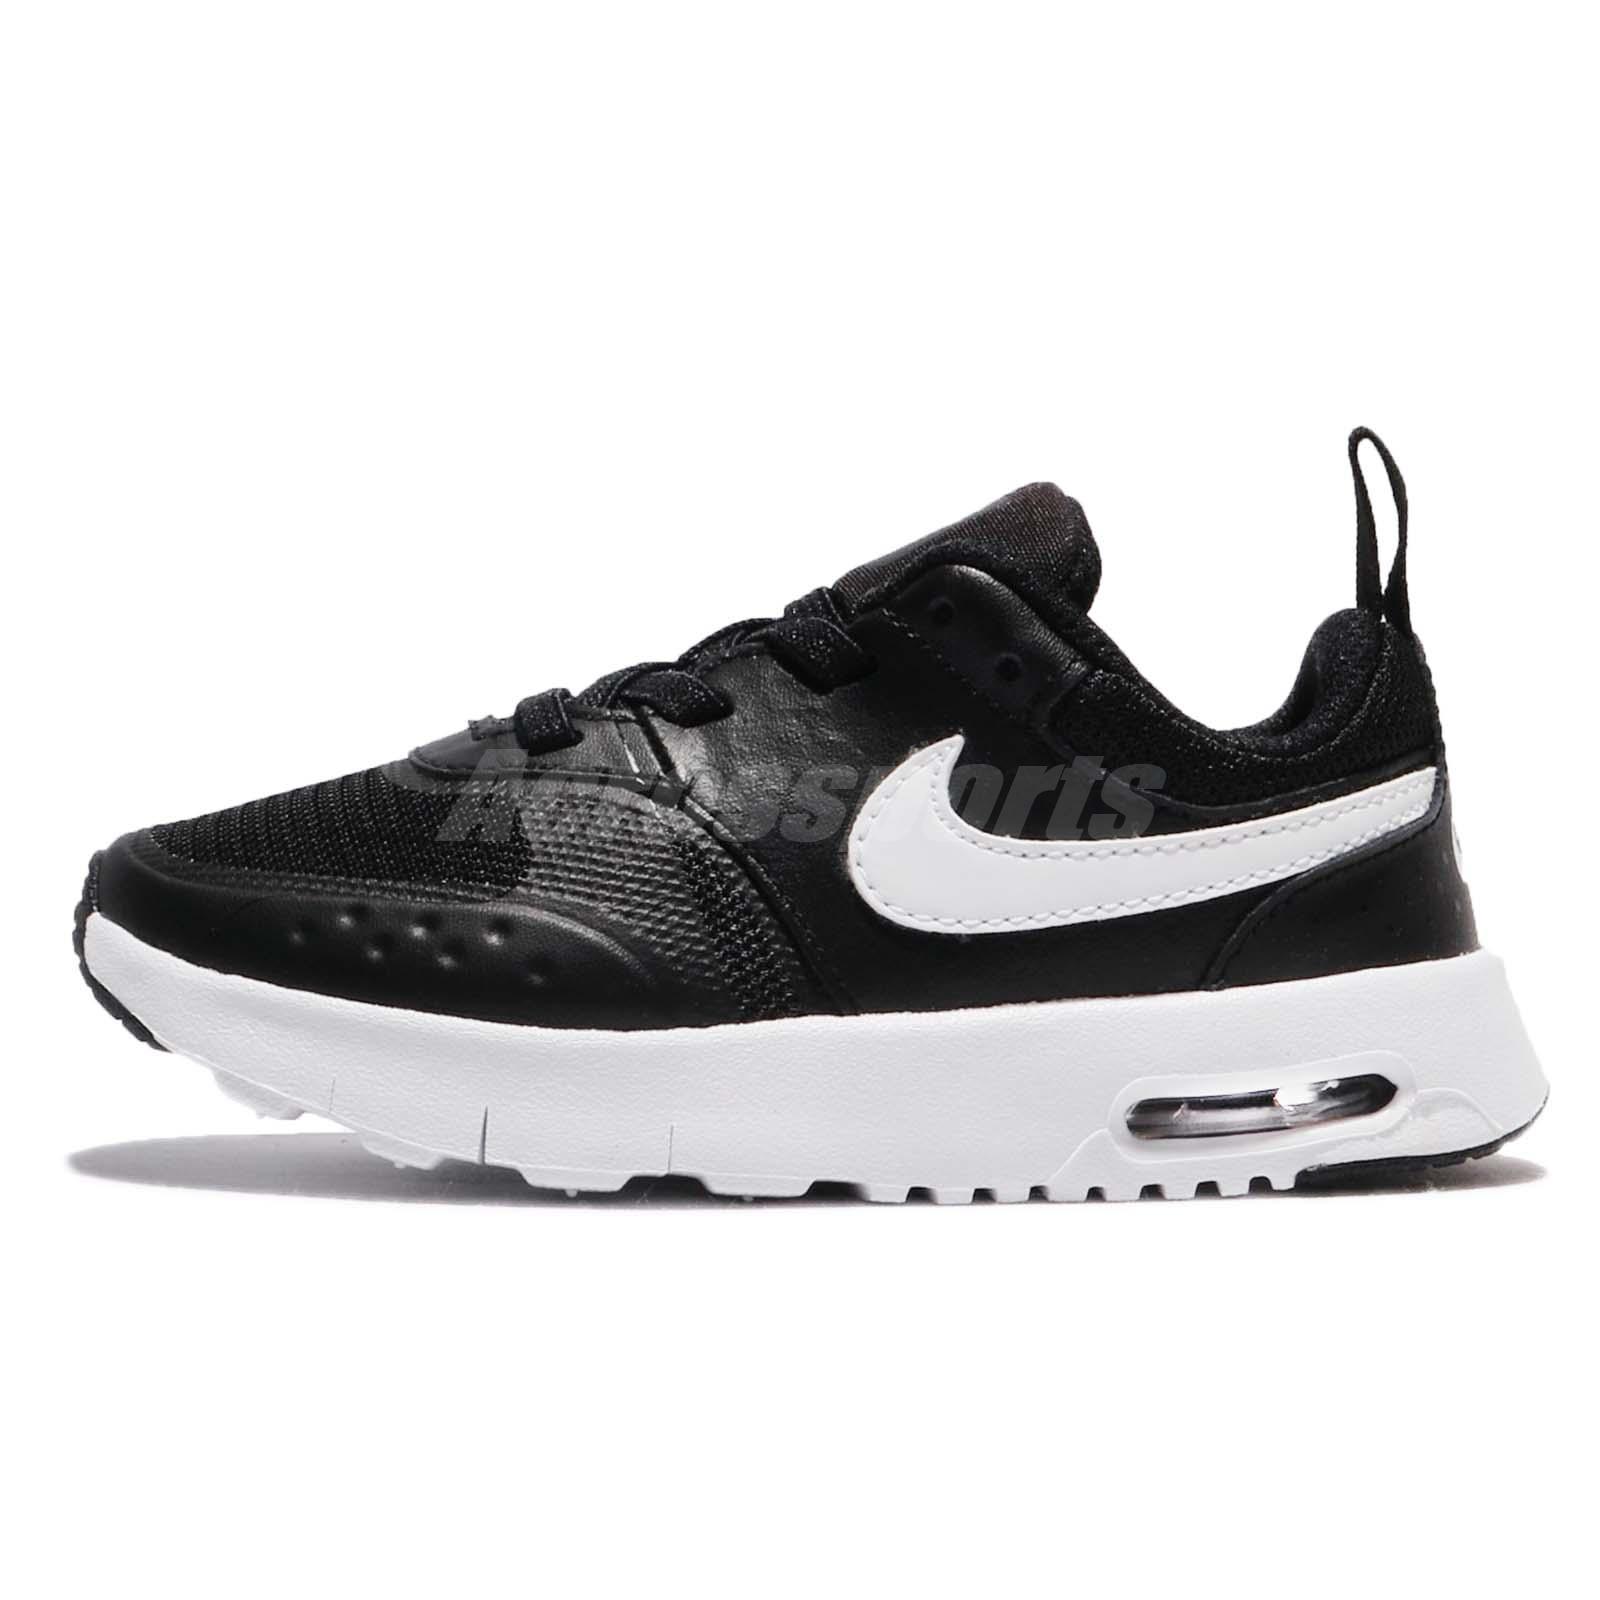 d178c01cb5e Nike Air Max Vision TDE Black White Toddler Infant Baby Shoes Sneaker  917860-009